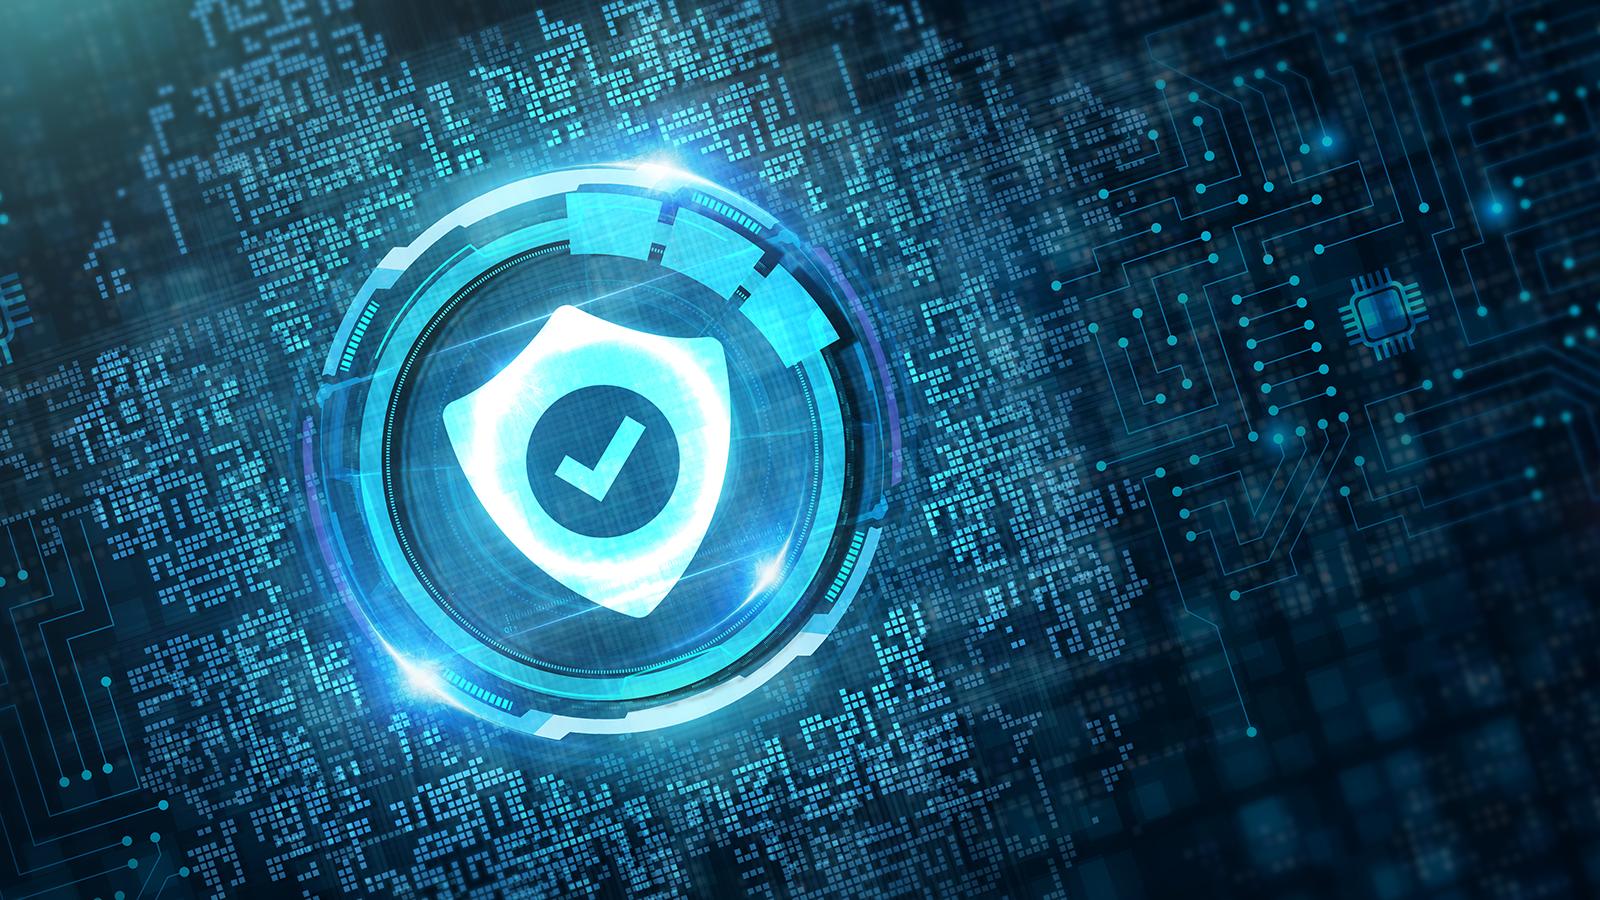 Embedded Software Verifizierung